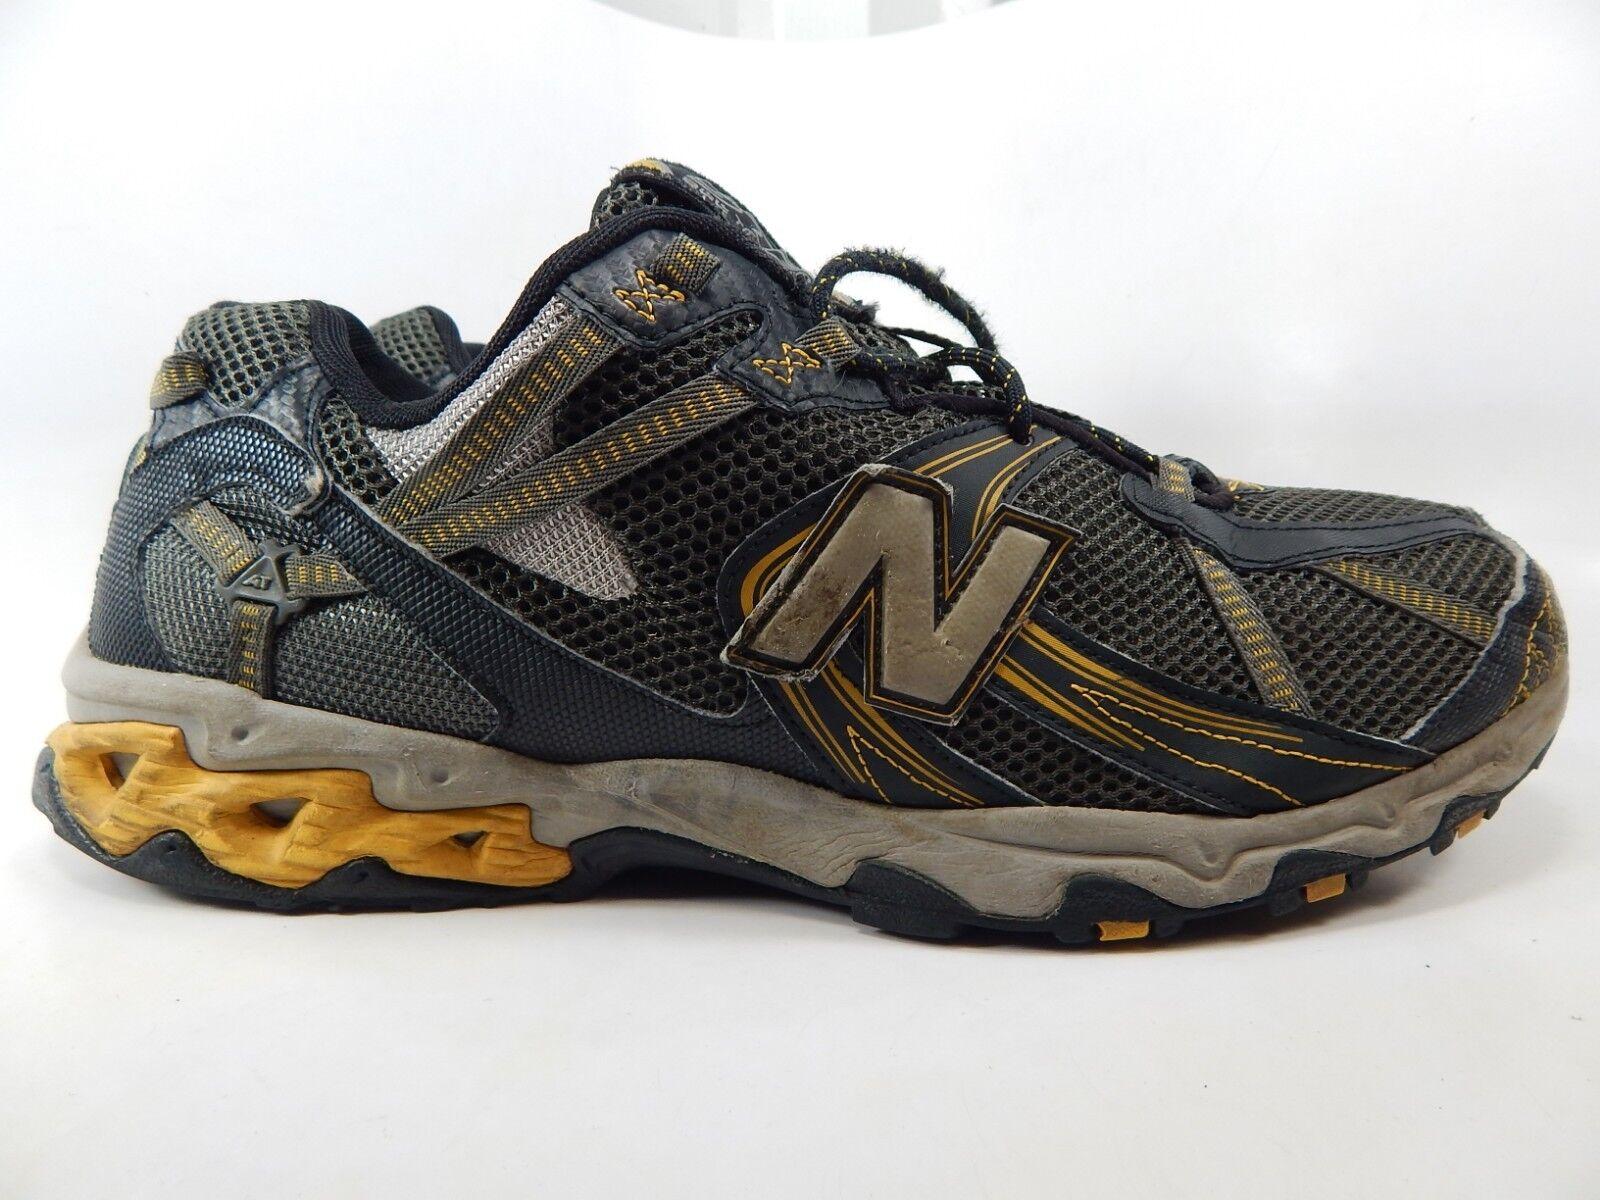 New Balance 572 Size US 14 M (D) EU 49 Men's Trail Running shoes Black MT572BY